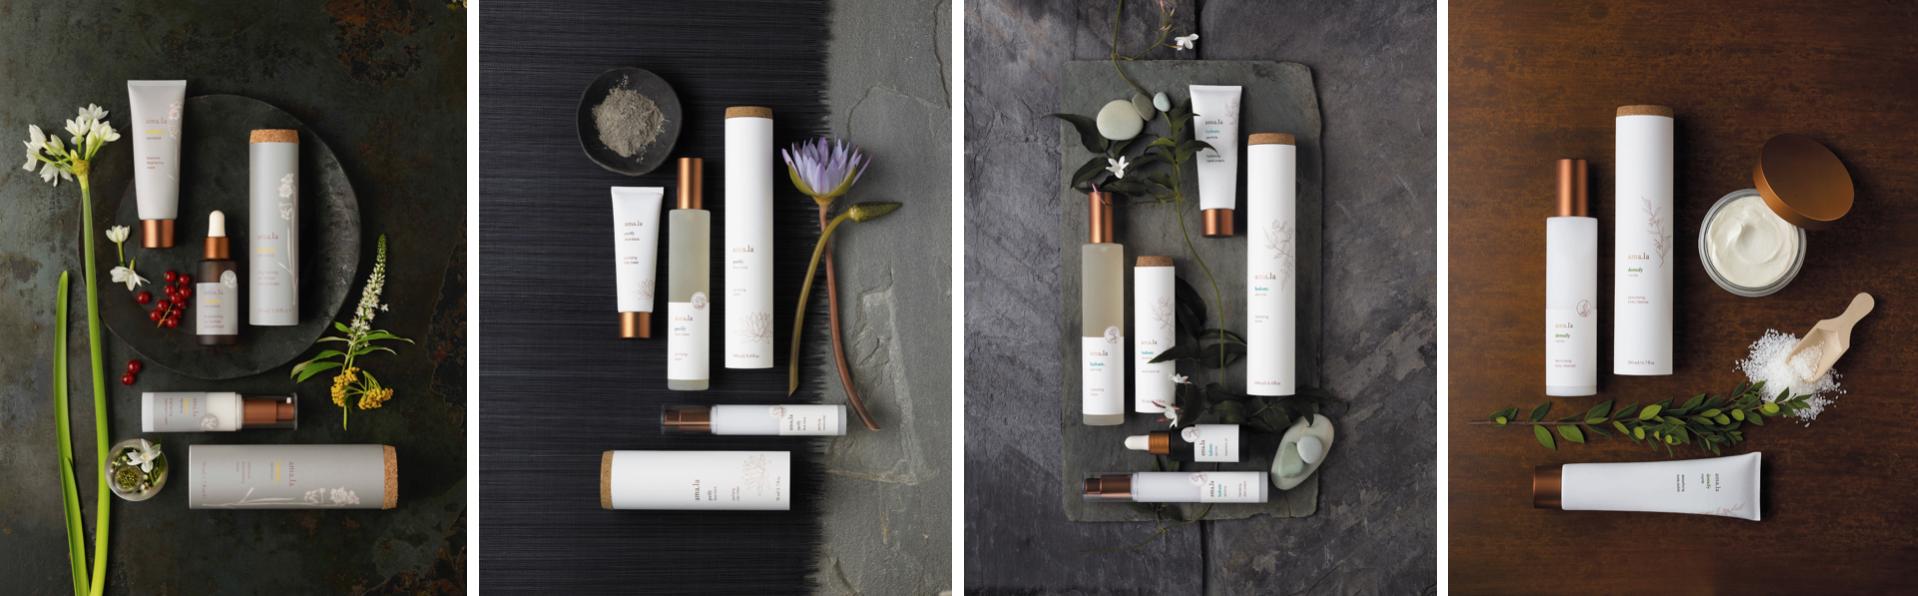 Amala Luxury Skincare Presented by Spa Wellness Consulting Australia